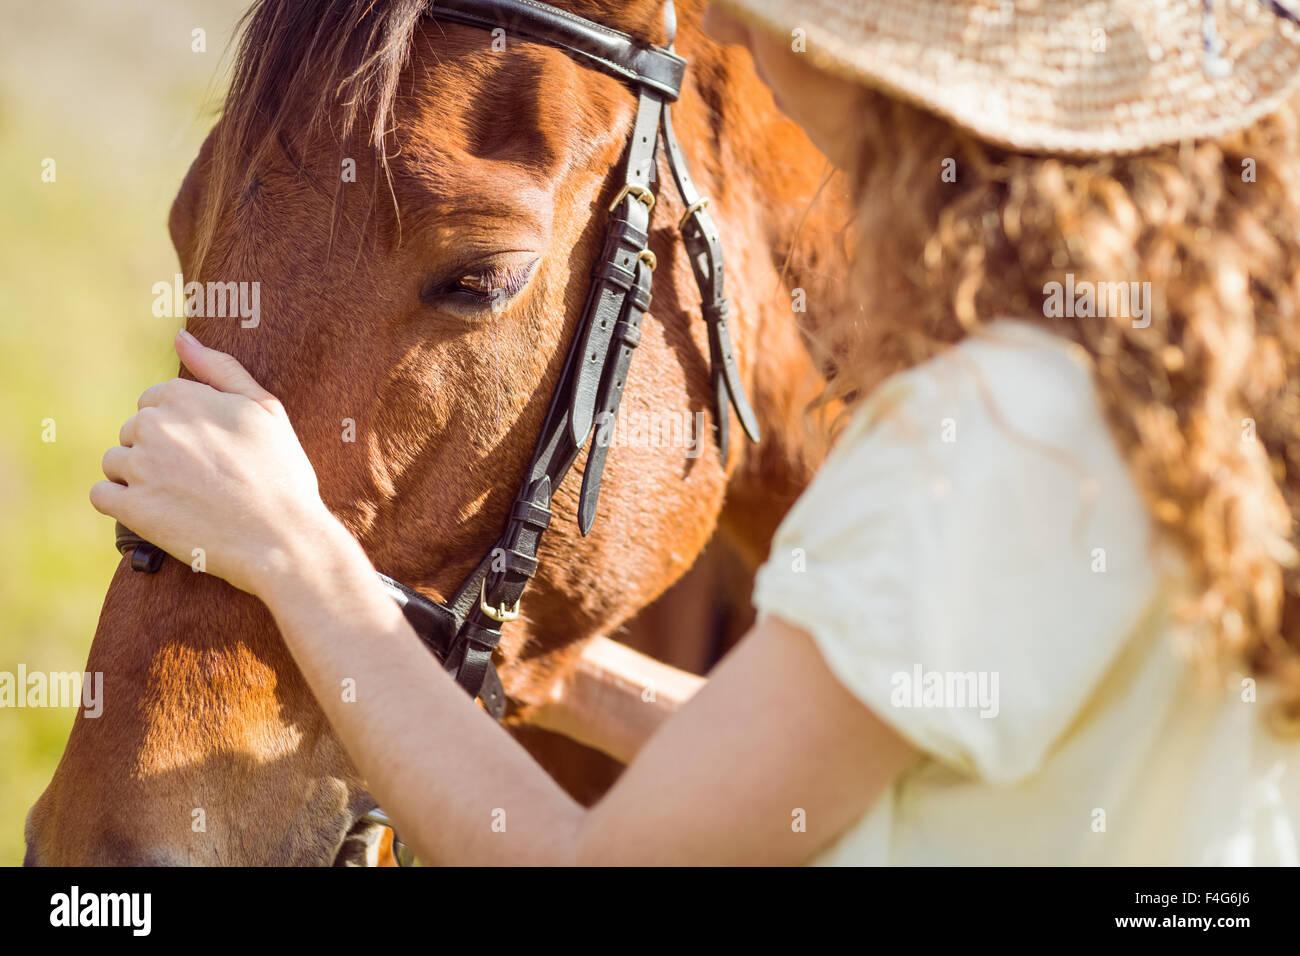 Mujer joven con su caballo Imagen De Stock